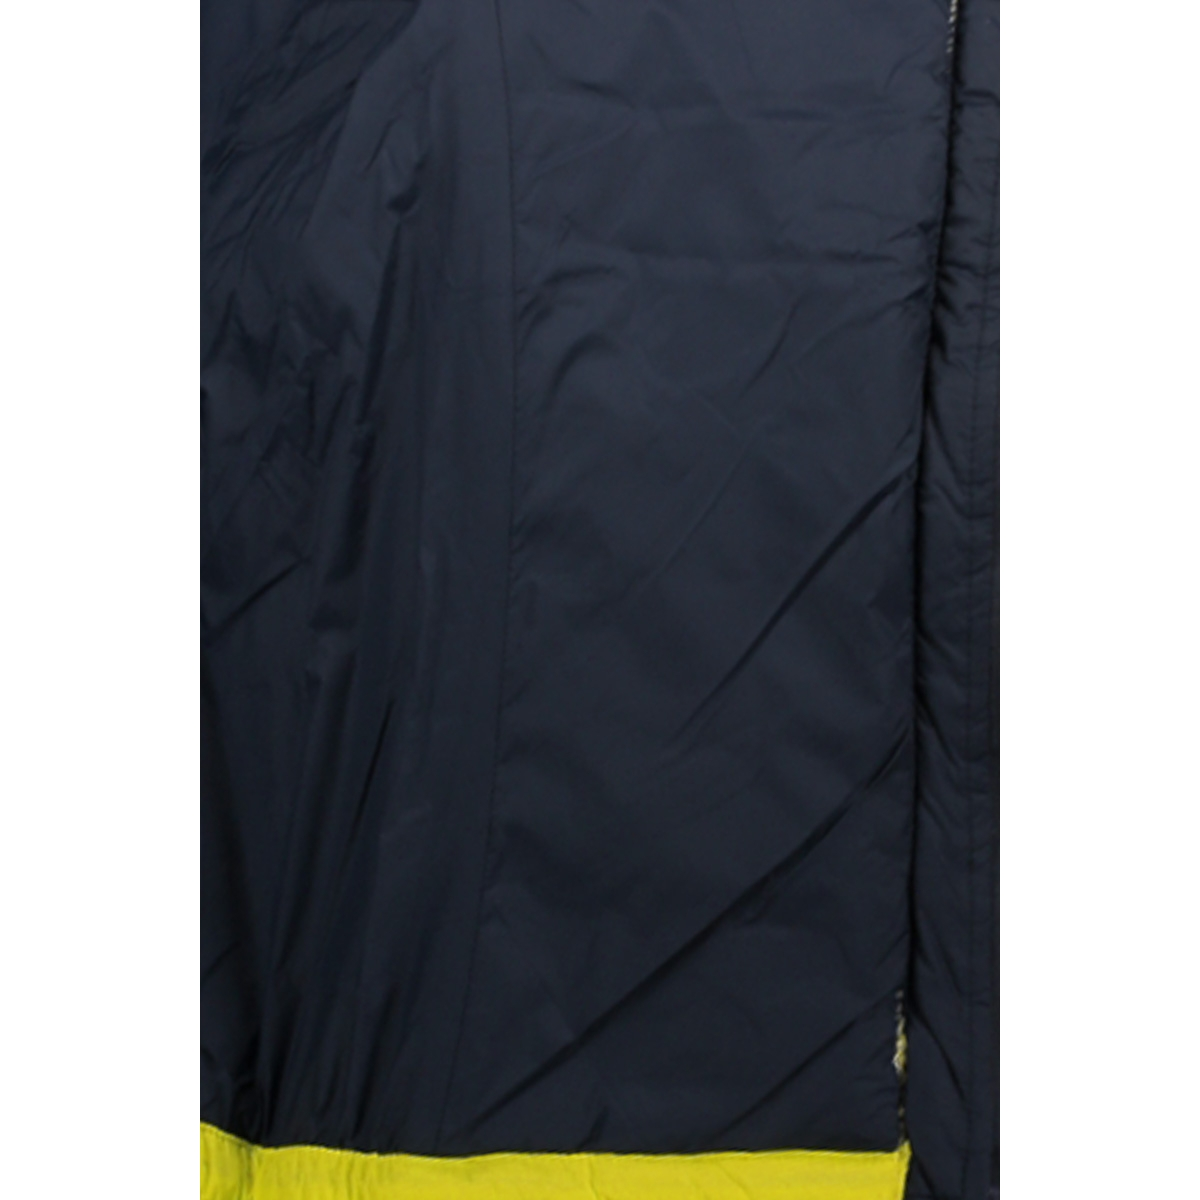 g50009npf4 hooded box quilt superdry jas lj6 yellow